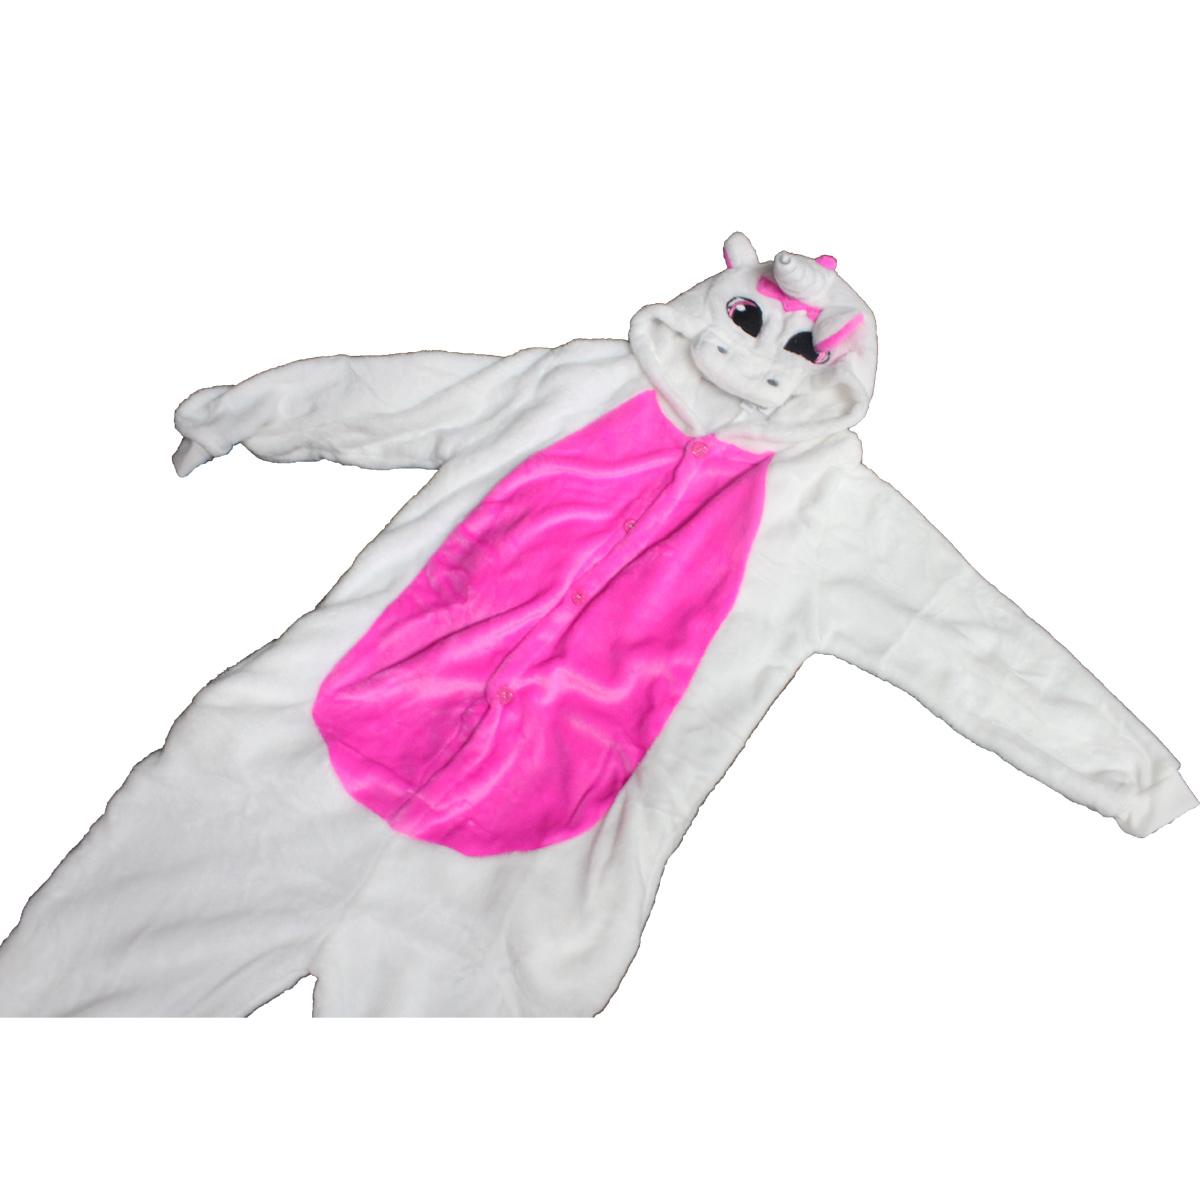 Tuta-Pigiama-Costume-Onesie-Carnevale-Halloween-Unisex-Bimbo-Bimba-Unicorno-Rosa